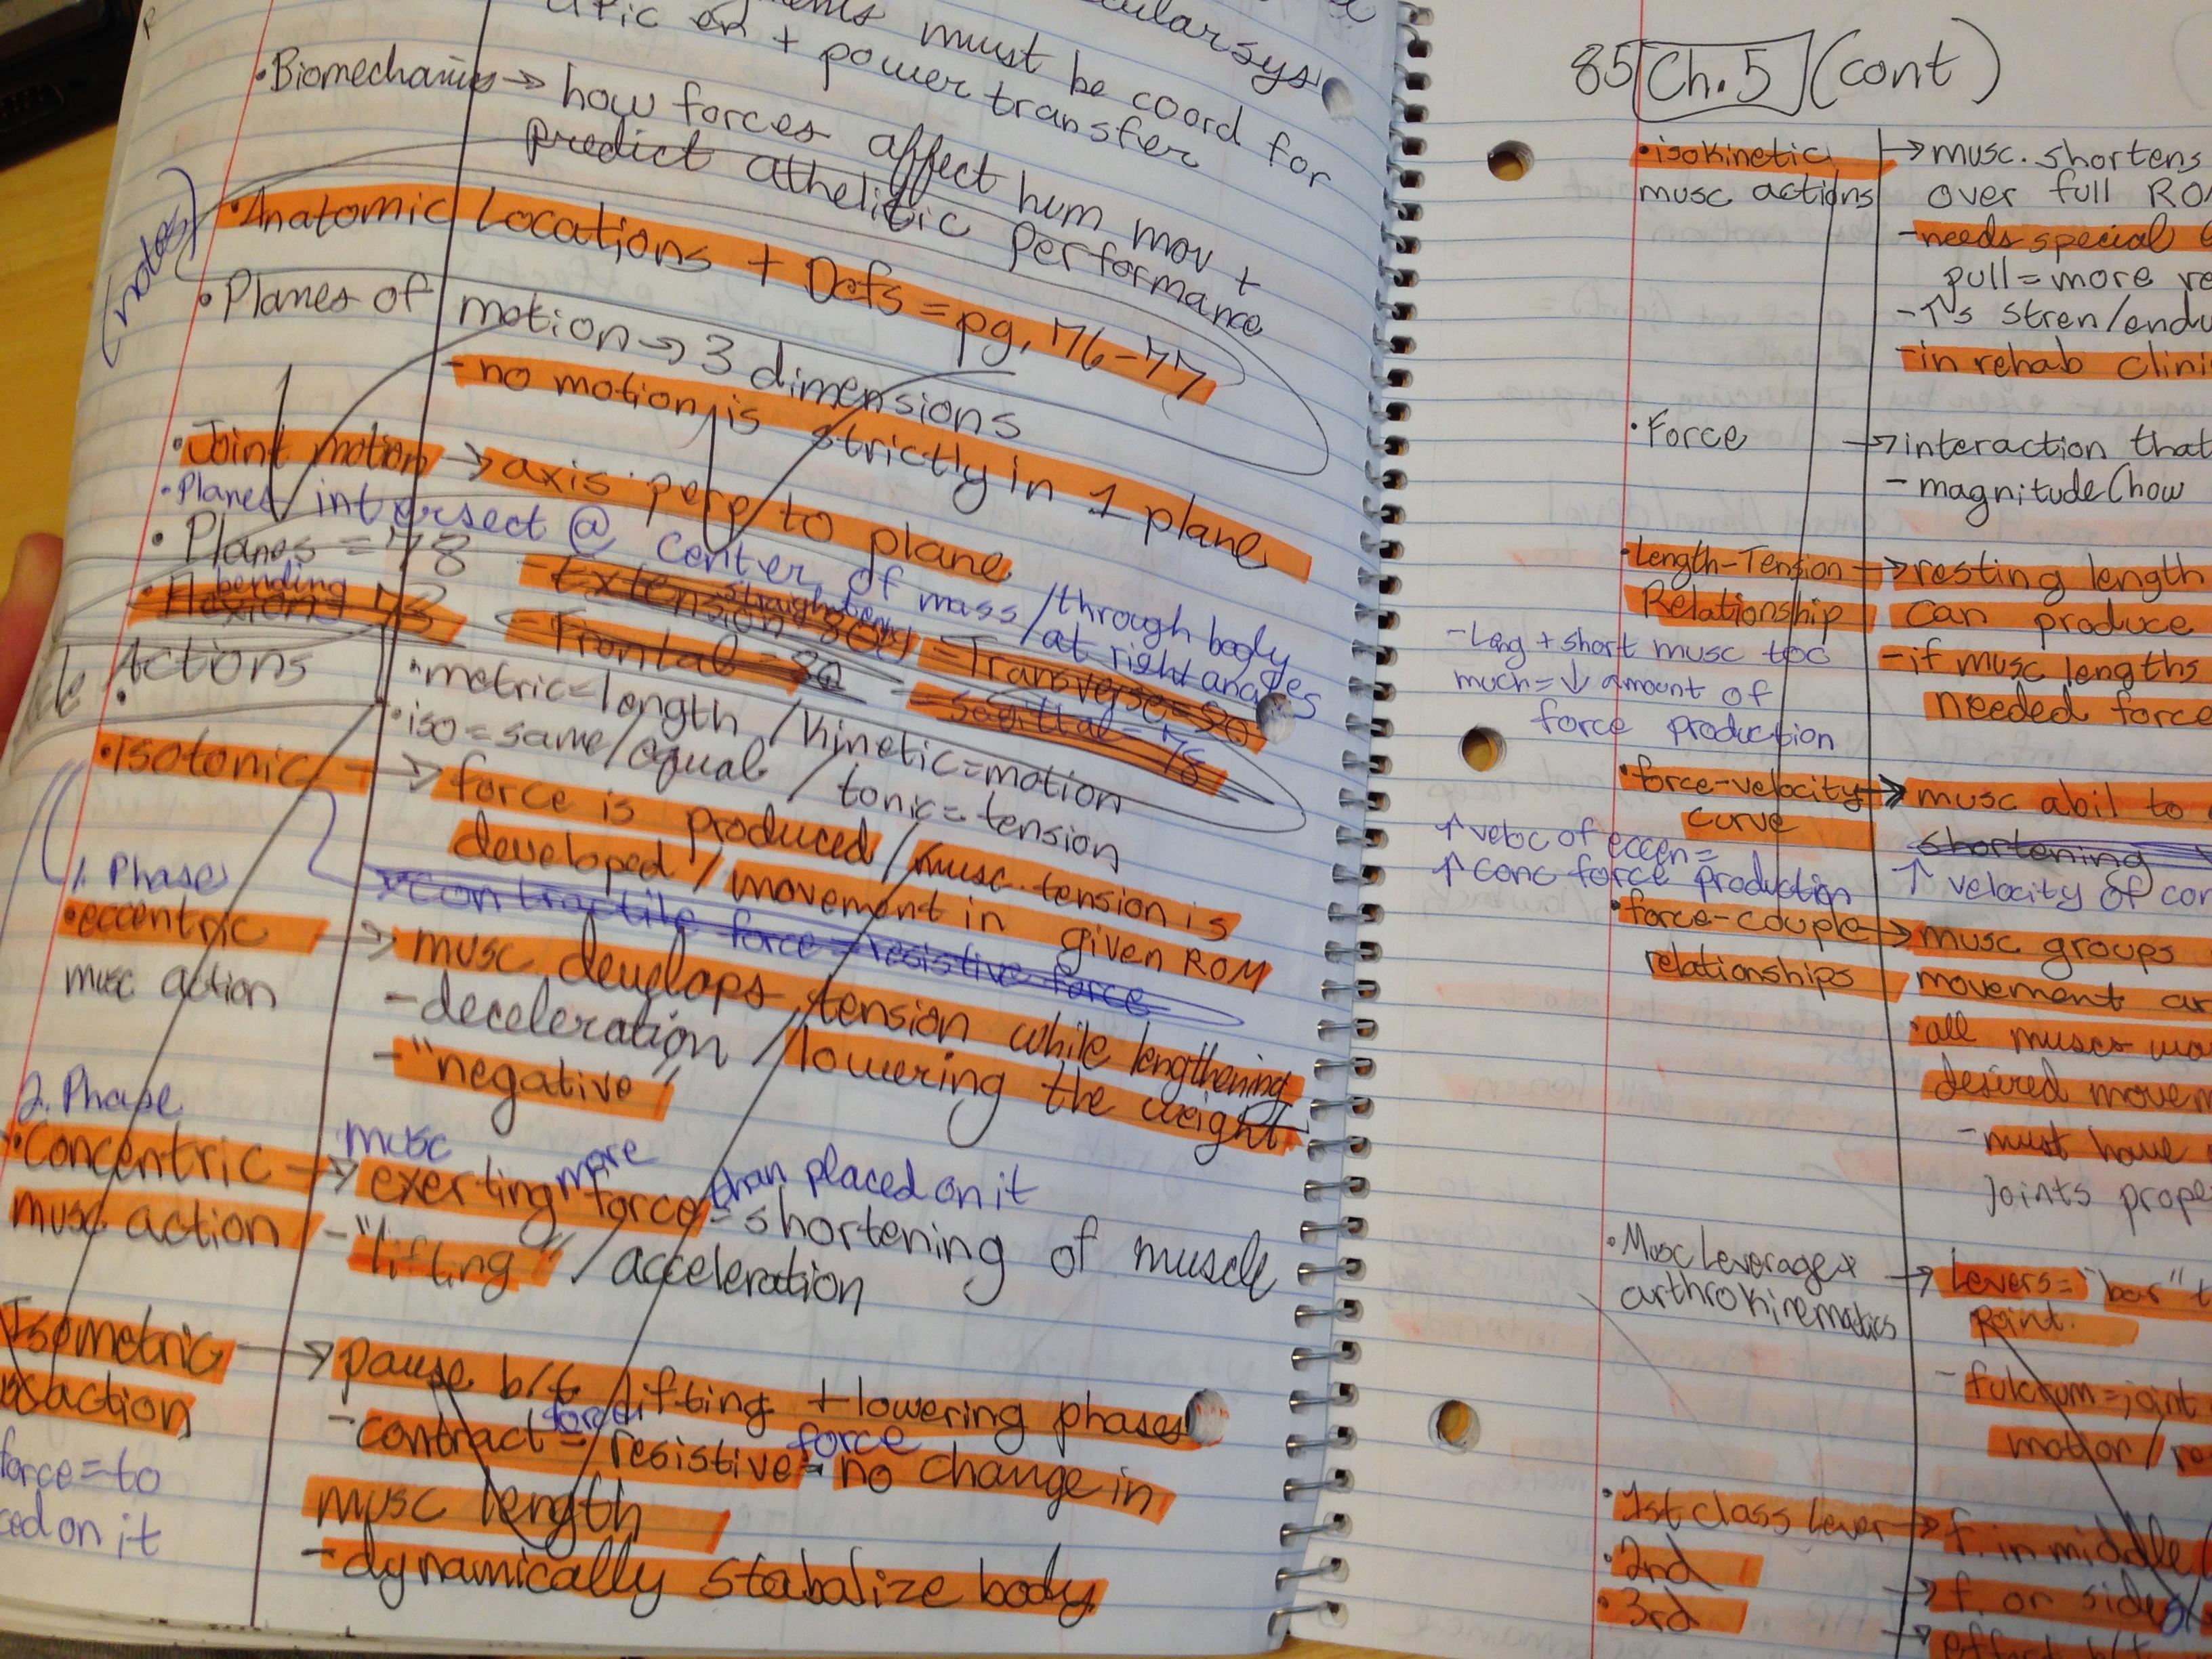 Nasm study tips wrecking routine img1936 xflitez Images